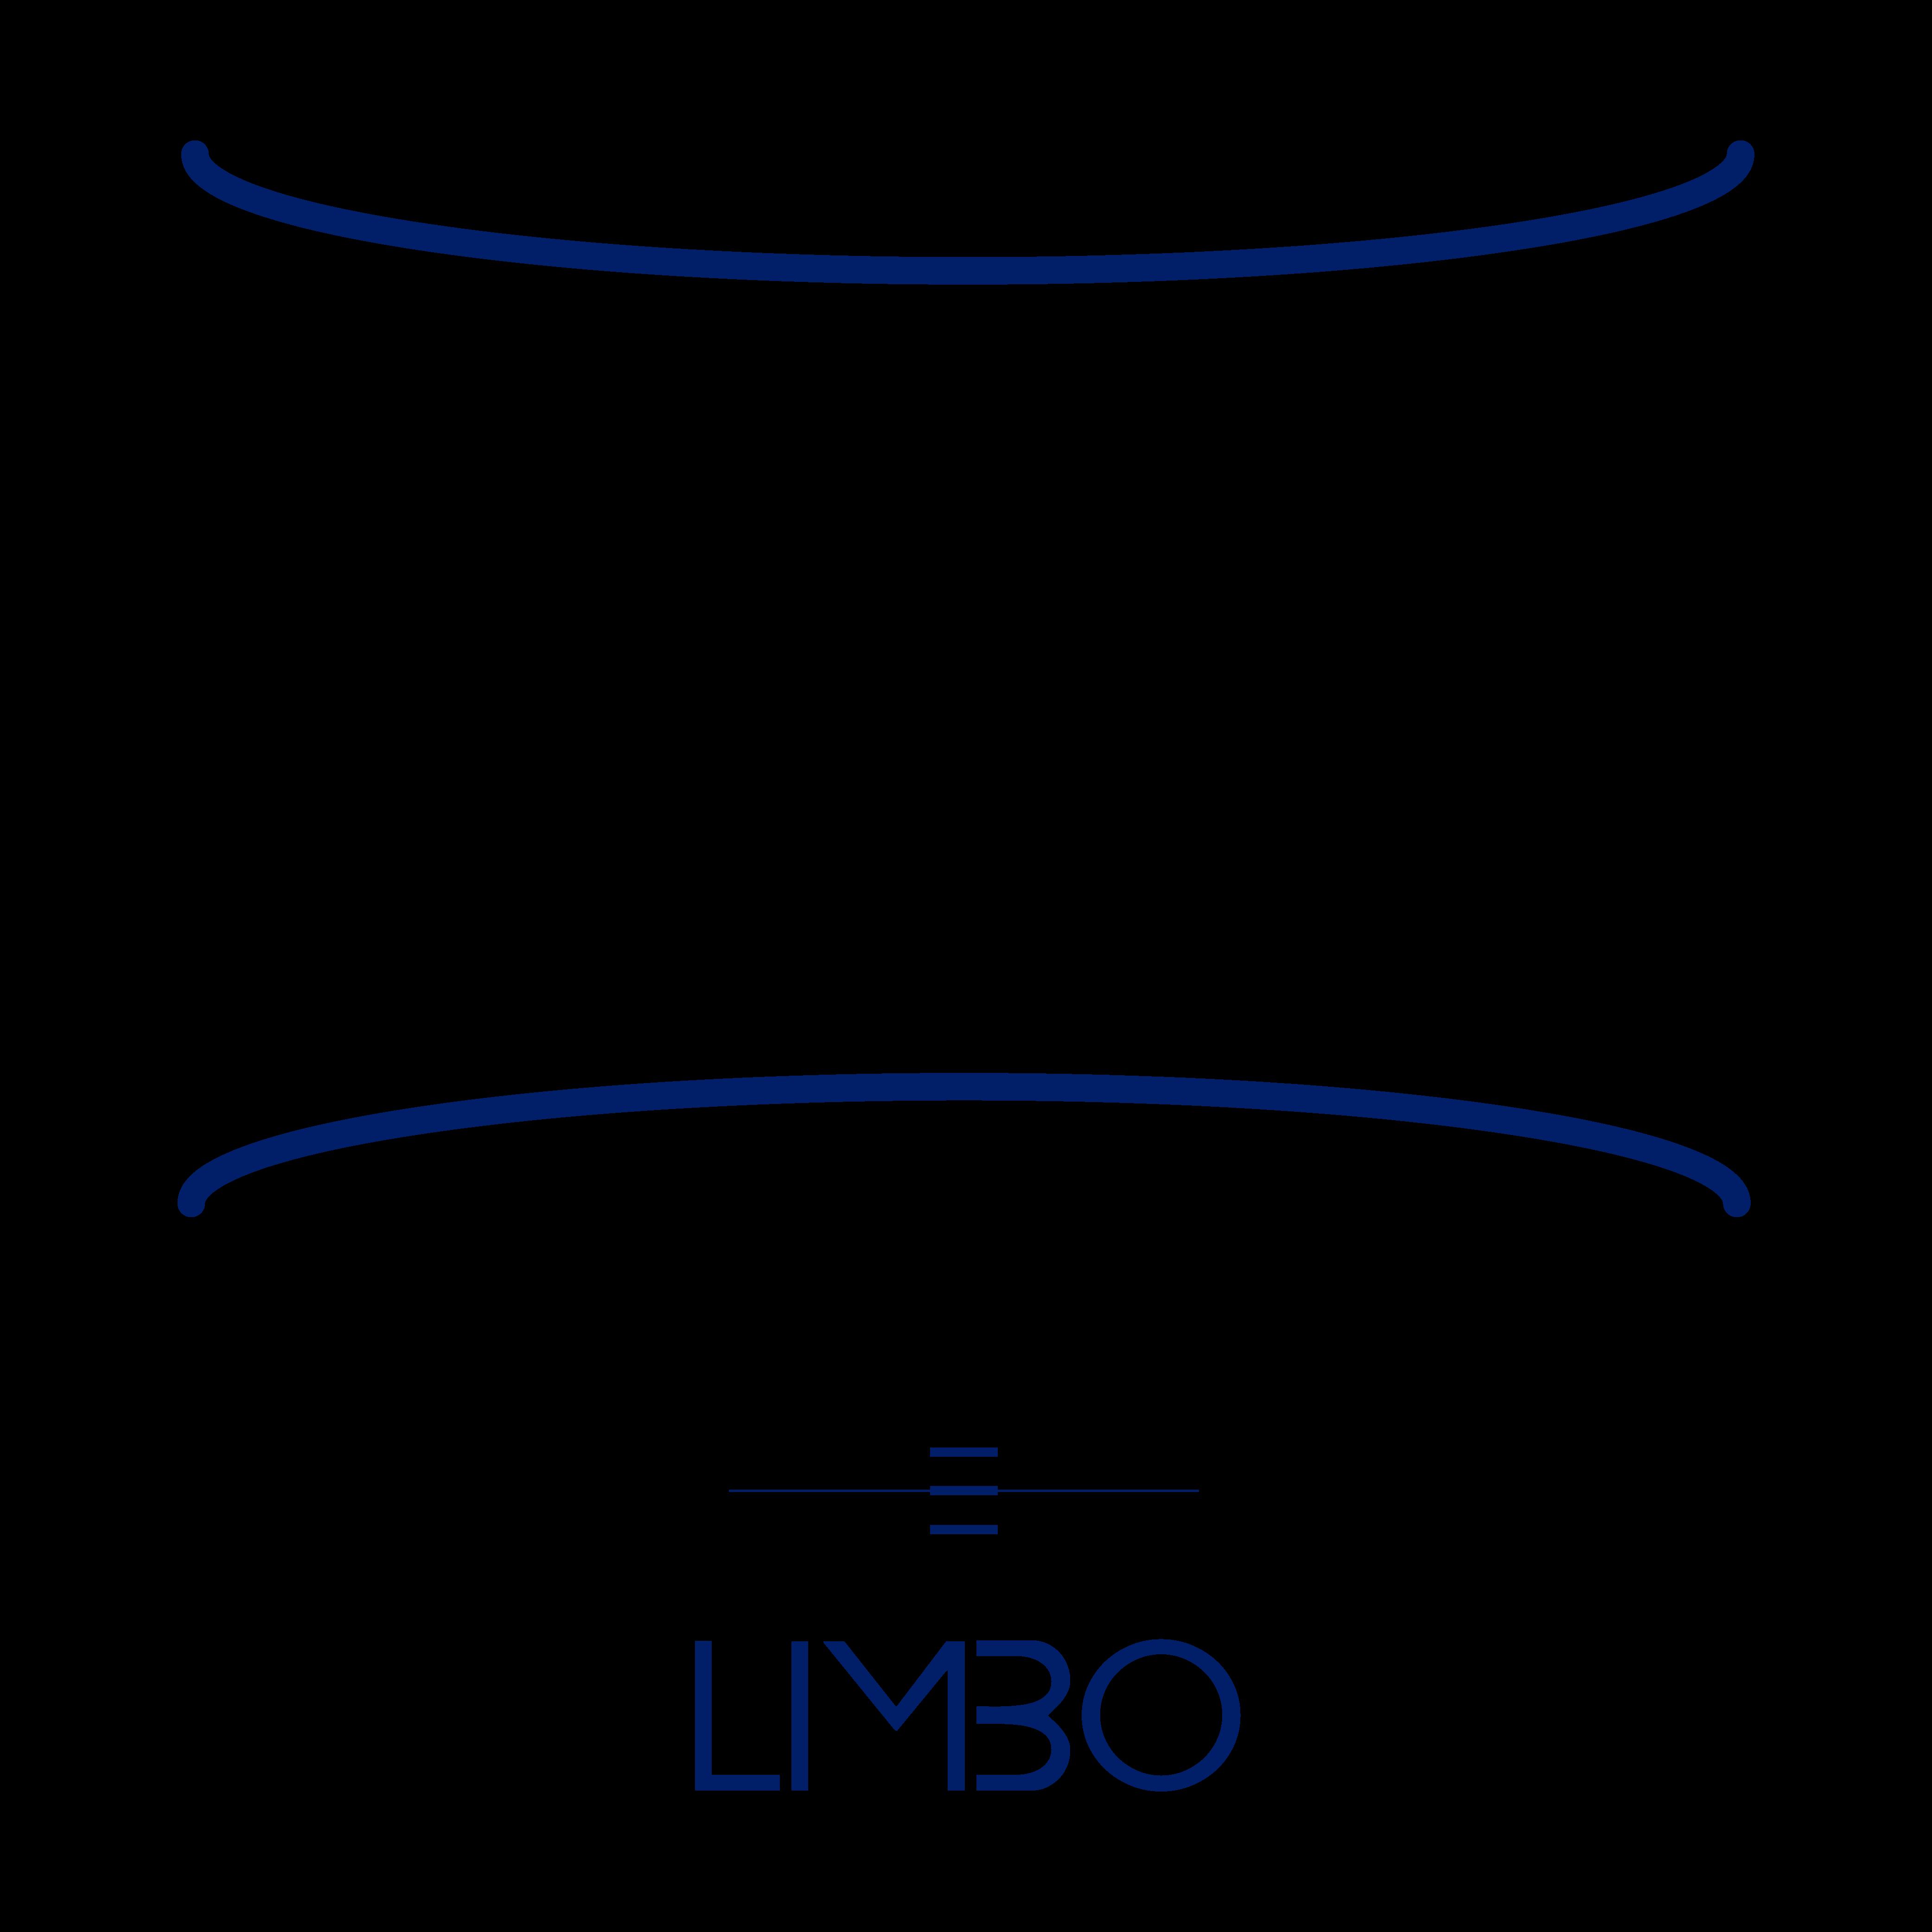 Pittogrammi Area 51 BIS Limbo BLU (01 Giugno 2021)